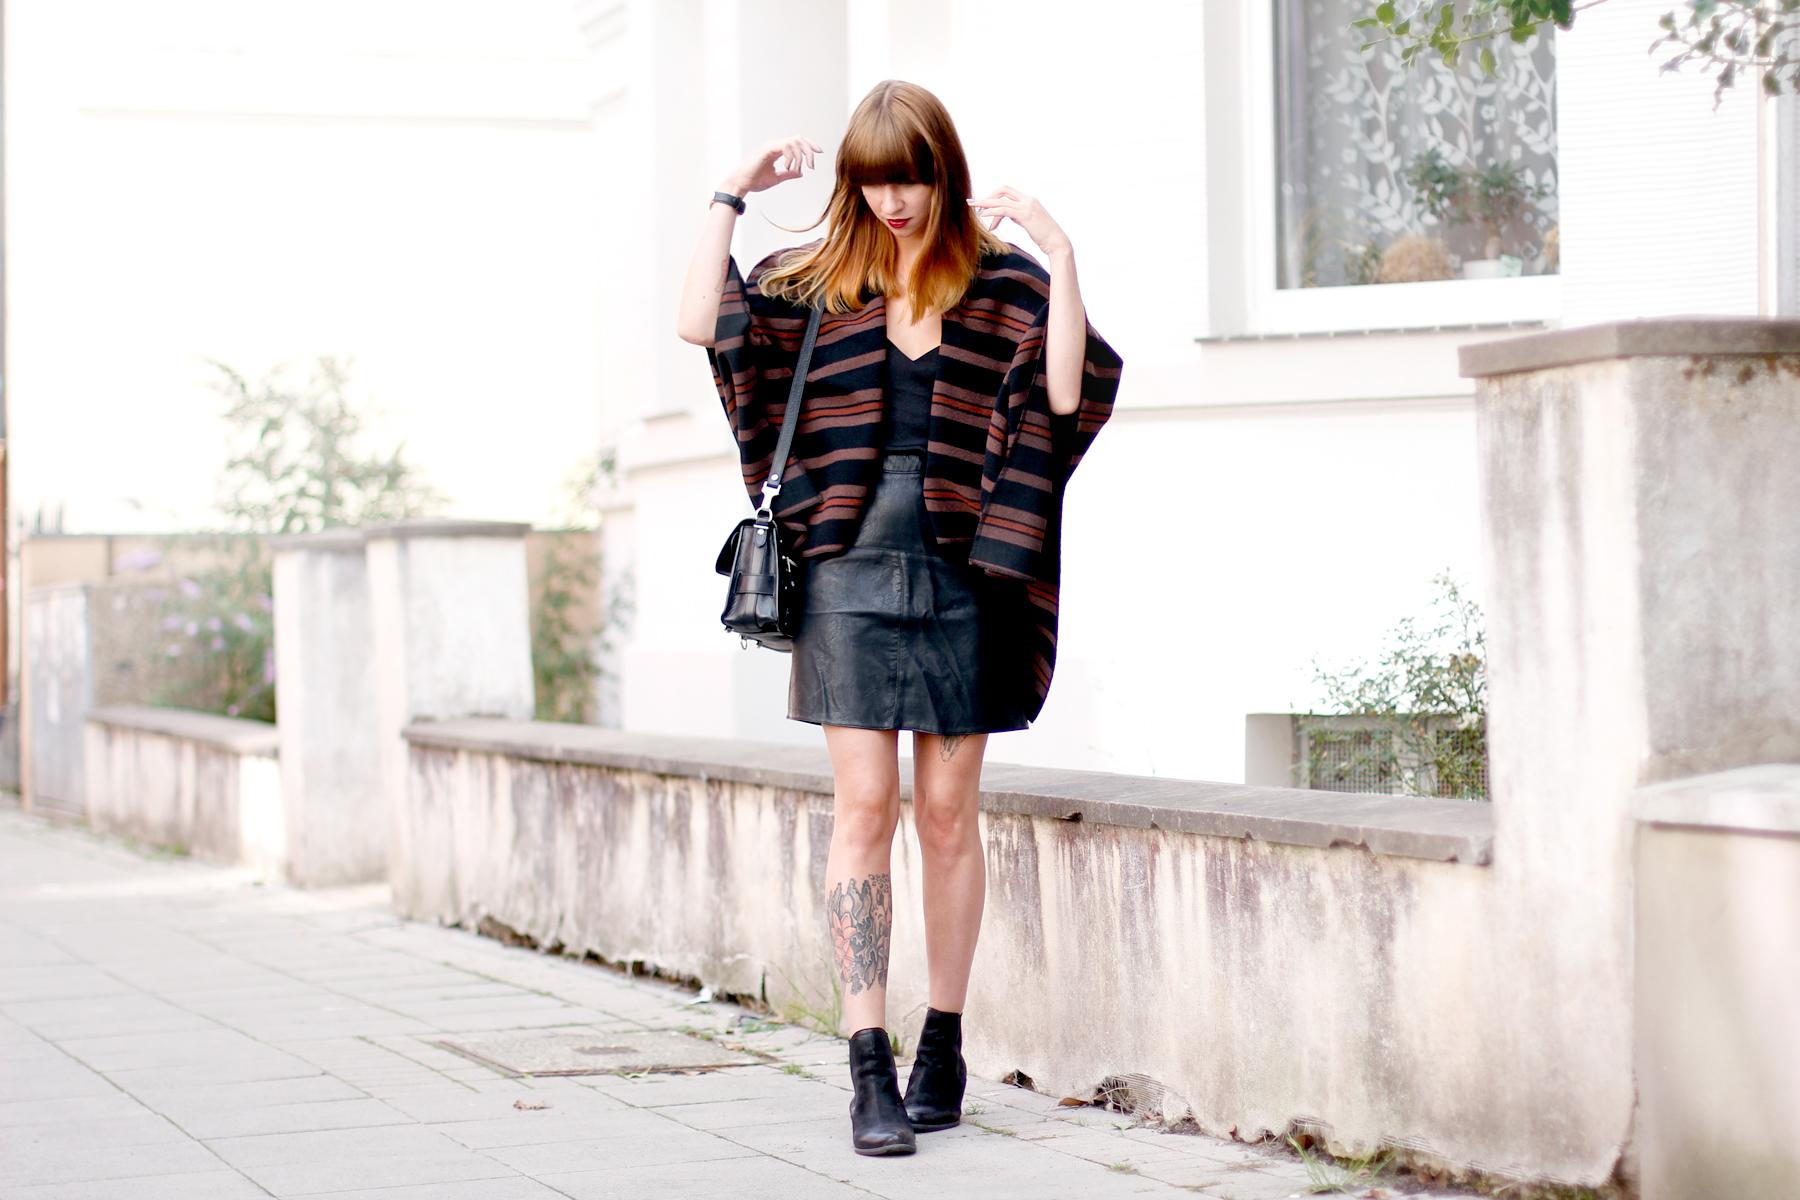 poncho lee jeans autumn cape boots sacha schuhe proenza schouler ps11 fashionblogger ricarda schernus blog düsseldorf hannover berlin cats & dogs 3